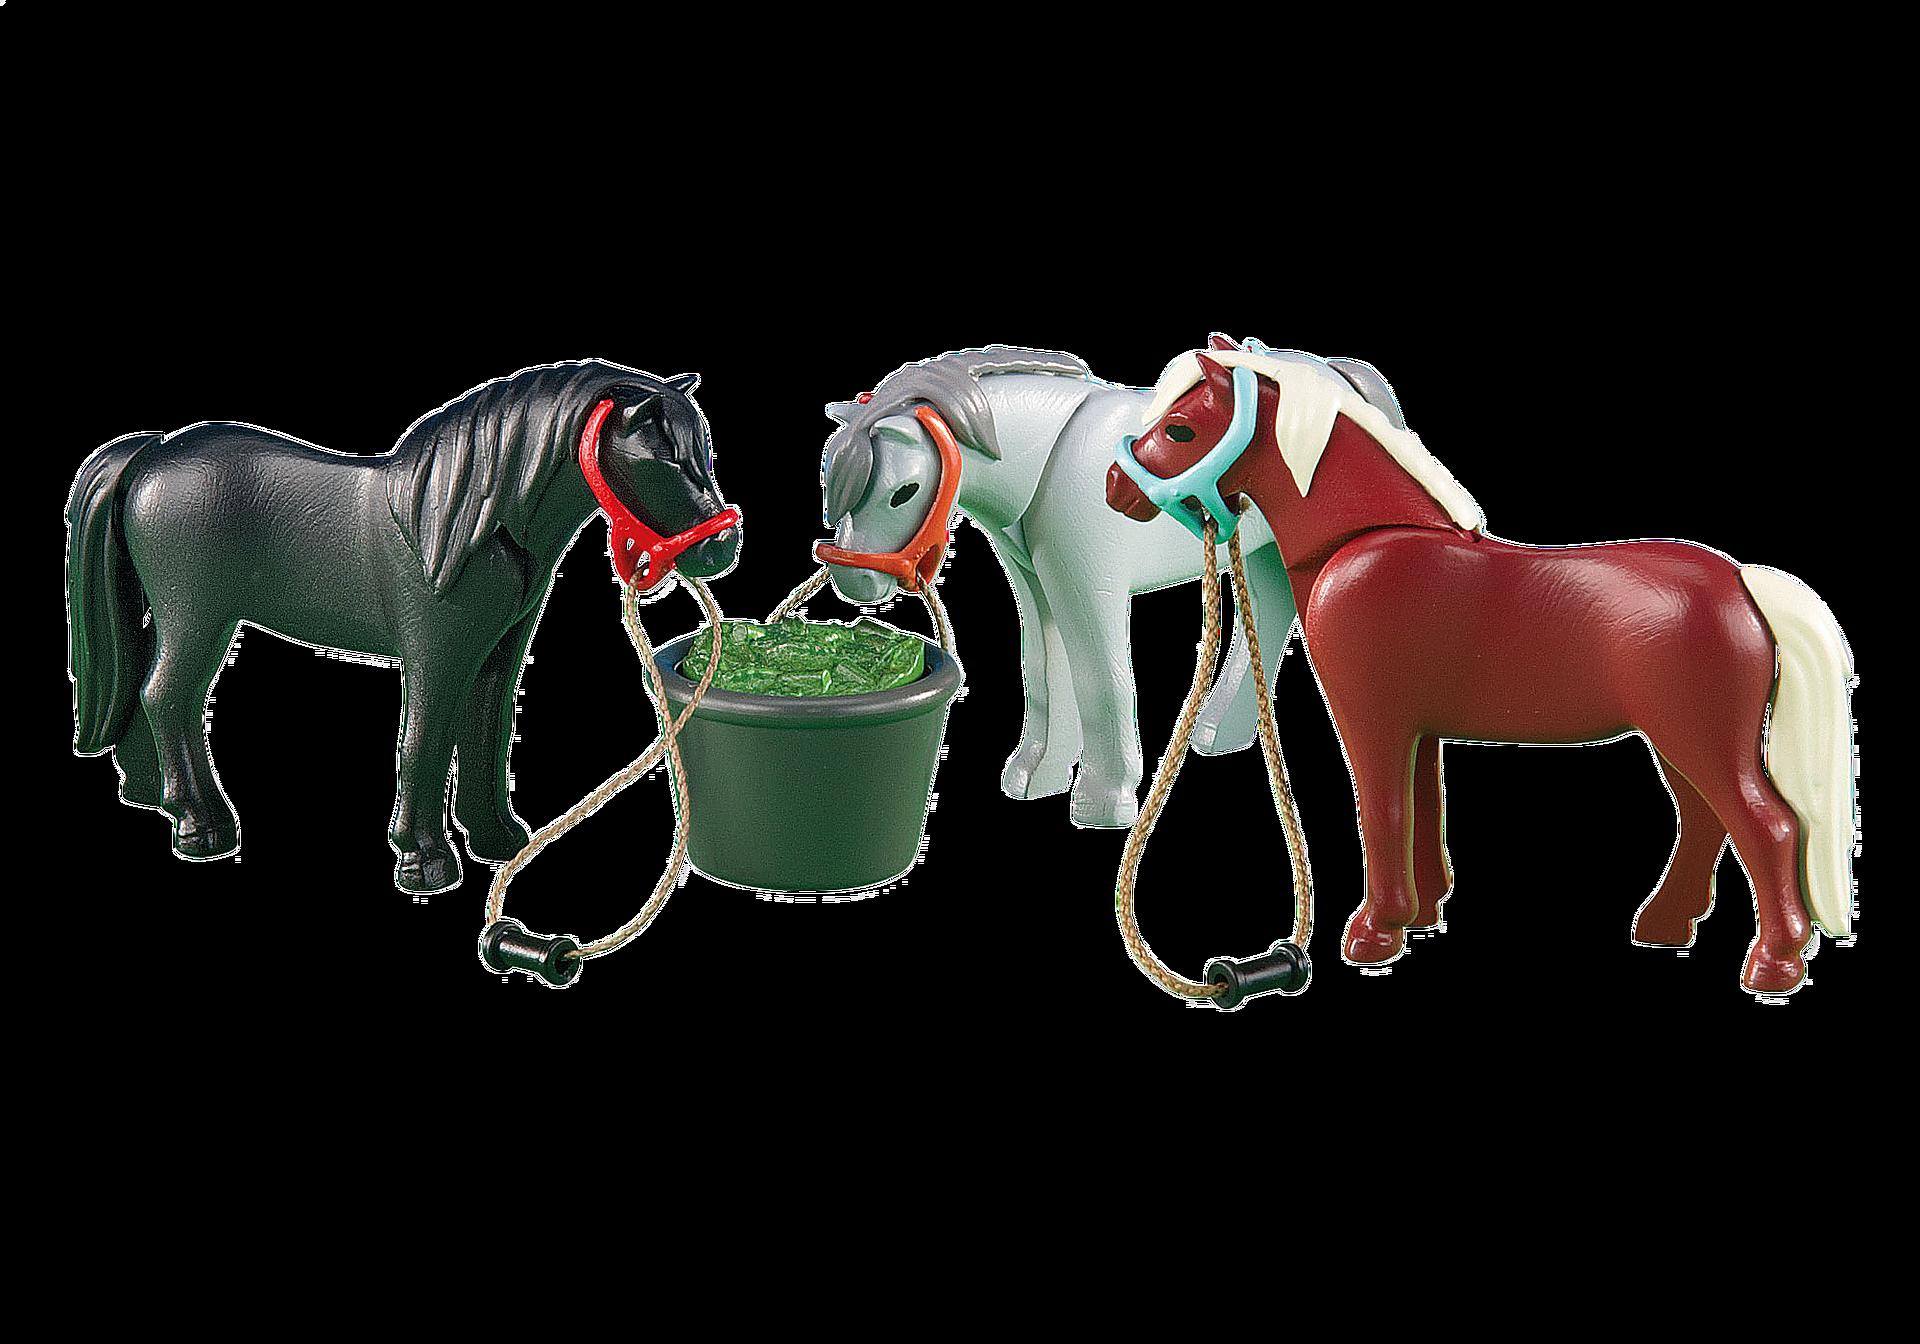 6256 3 Ponys mit Futtertrog zoom image1